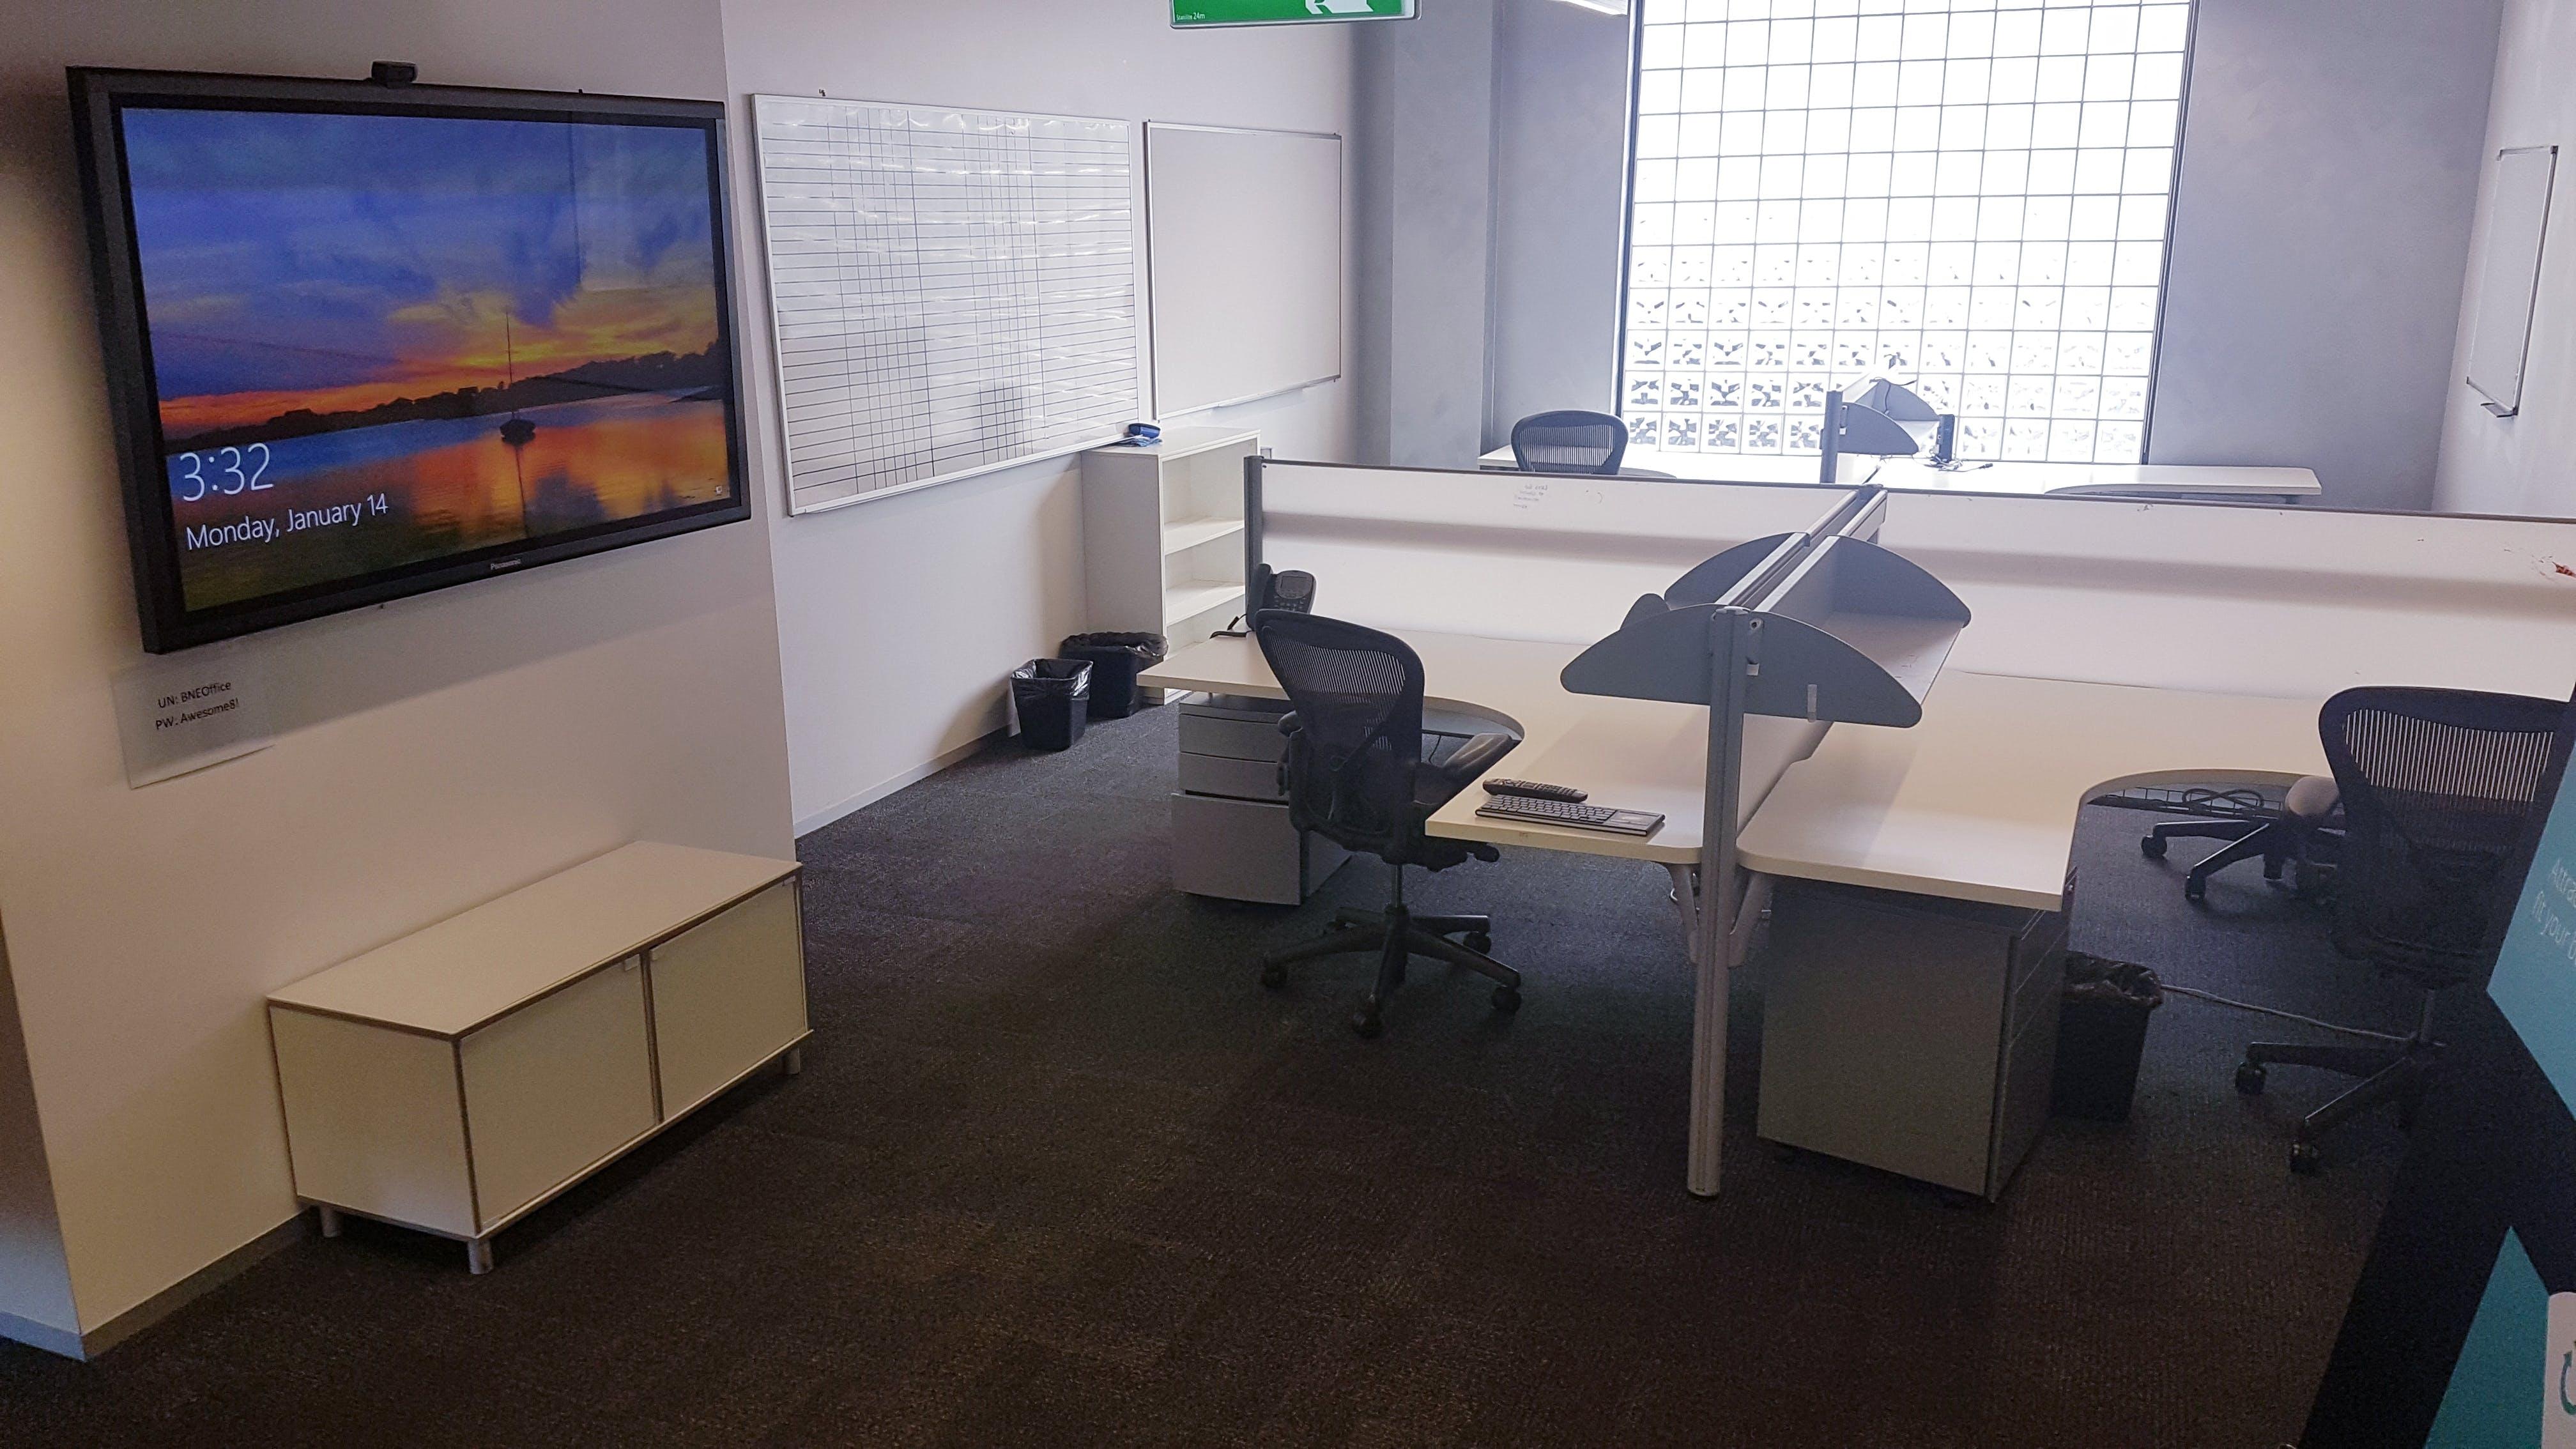 Dedicated desk at Panalitix HQ, image 1